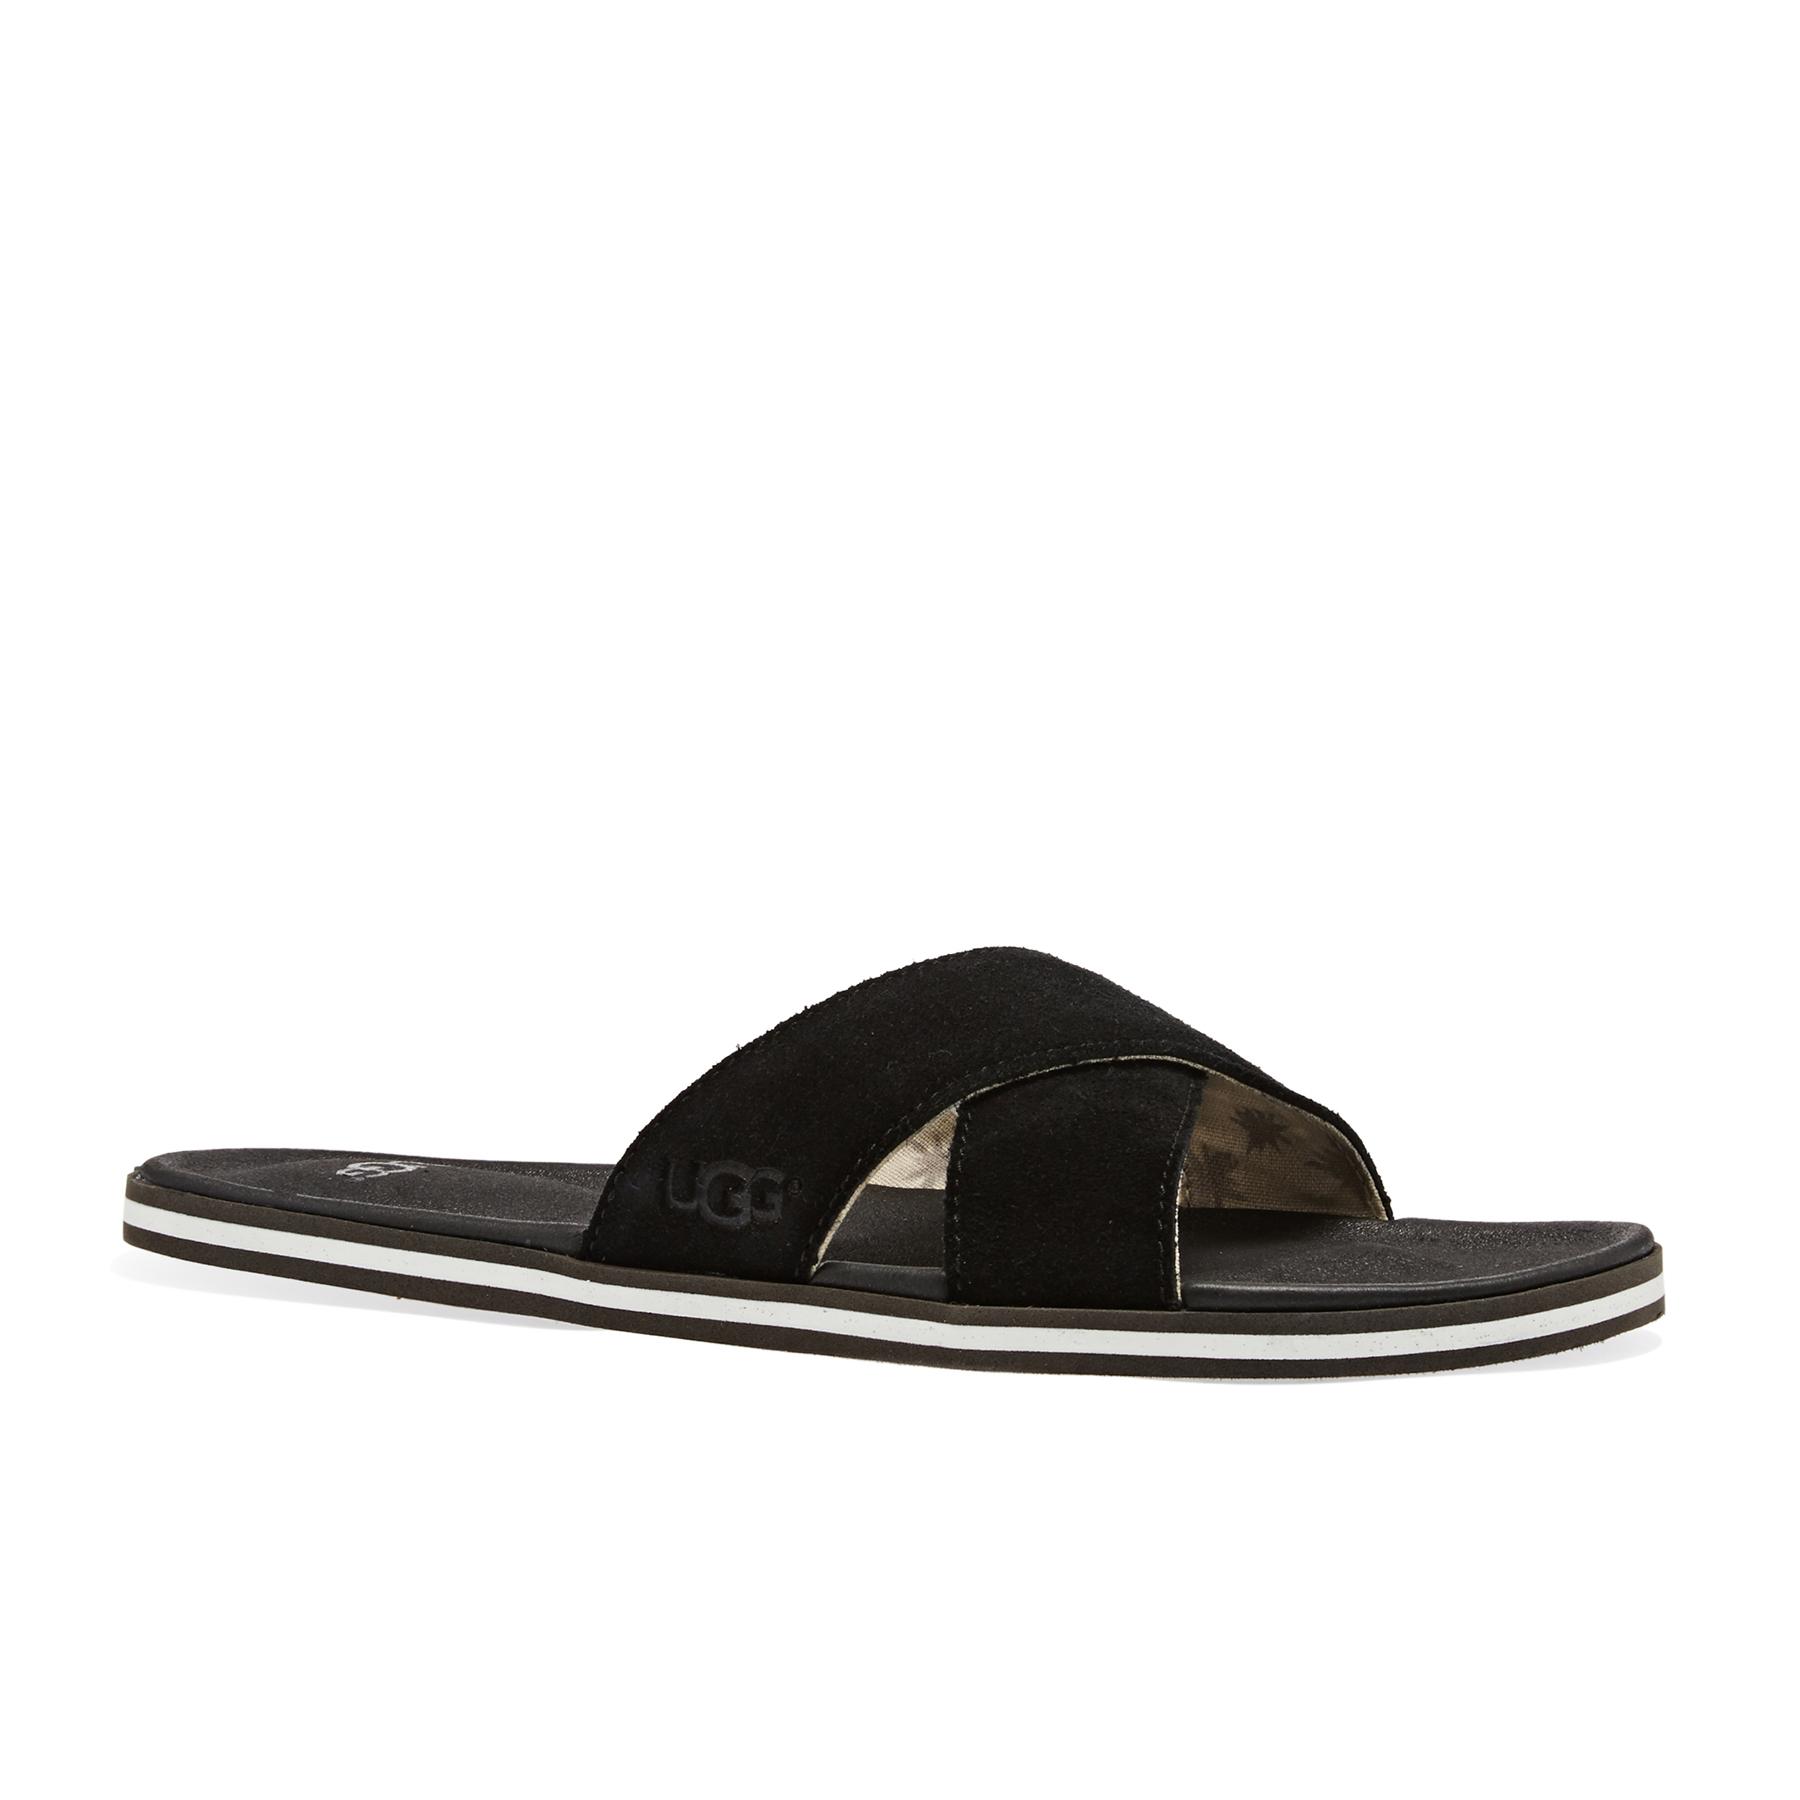 UGG Seaside Slide Tongs Tongs Chaussures Lifestyle